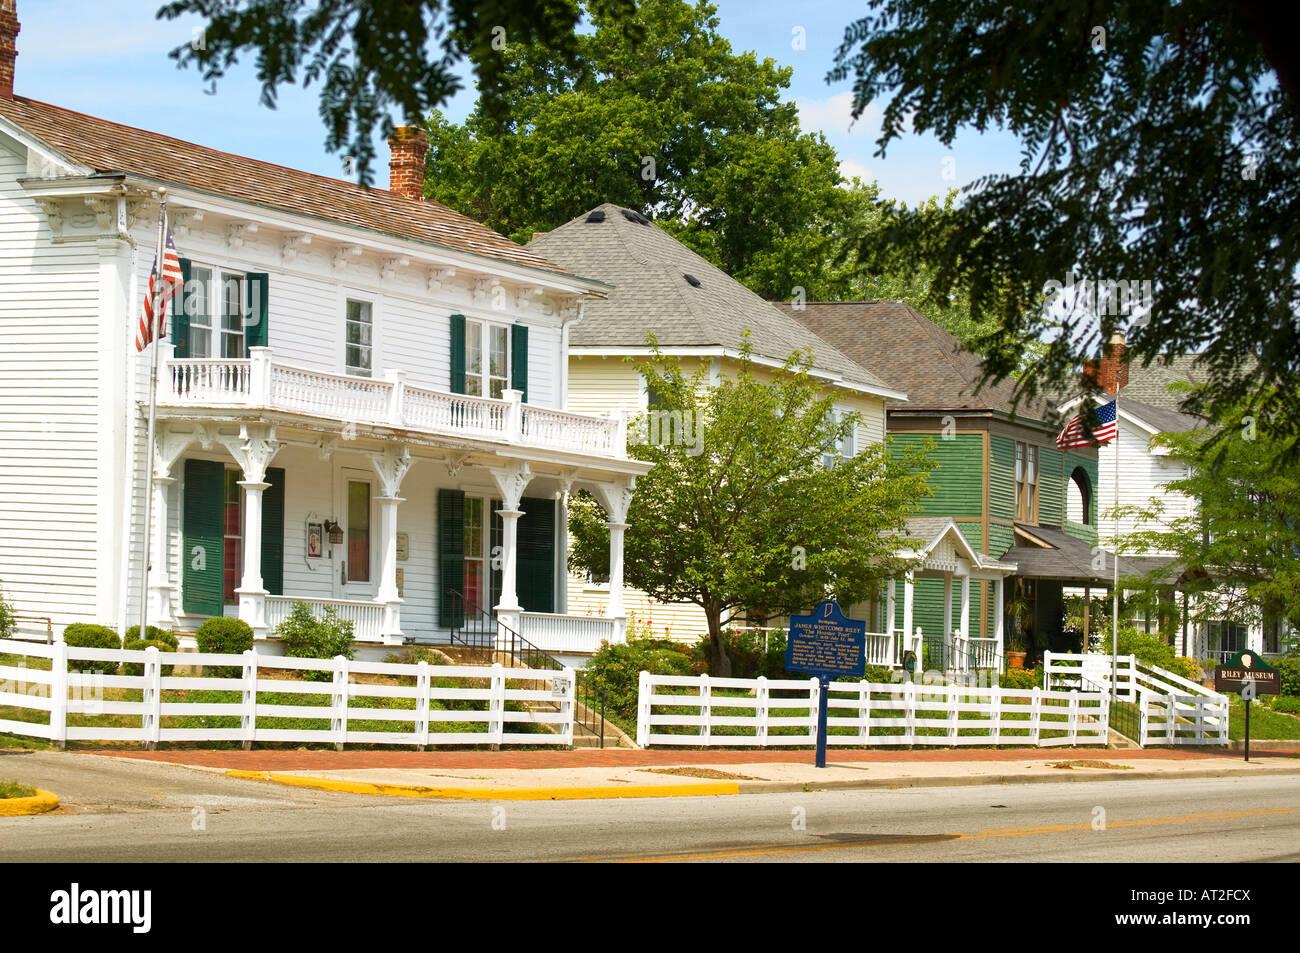 James Whitcomb Riley Boyhood Home, Greenfield Indiana - Stock Image